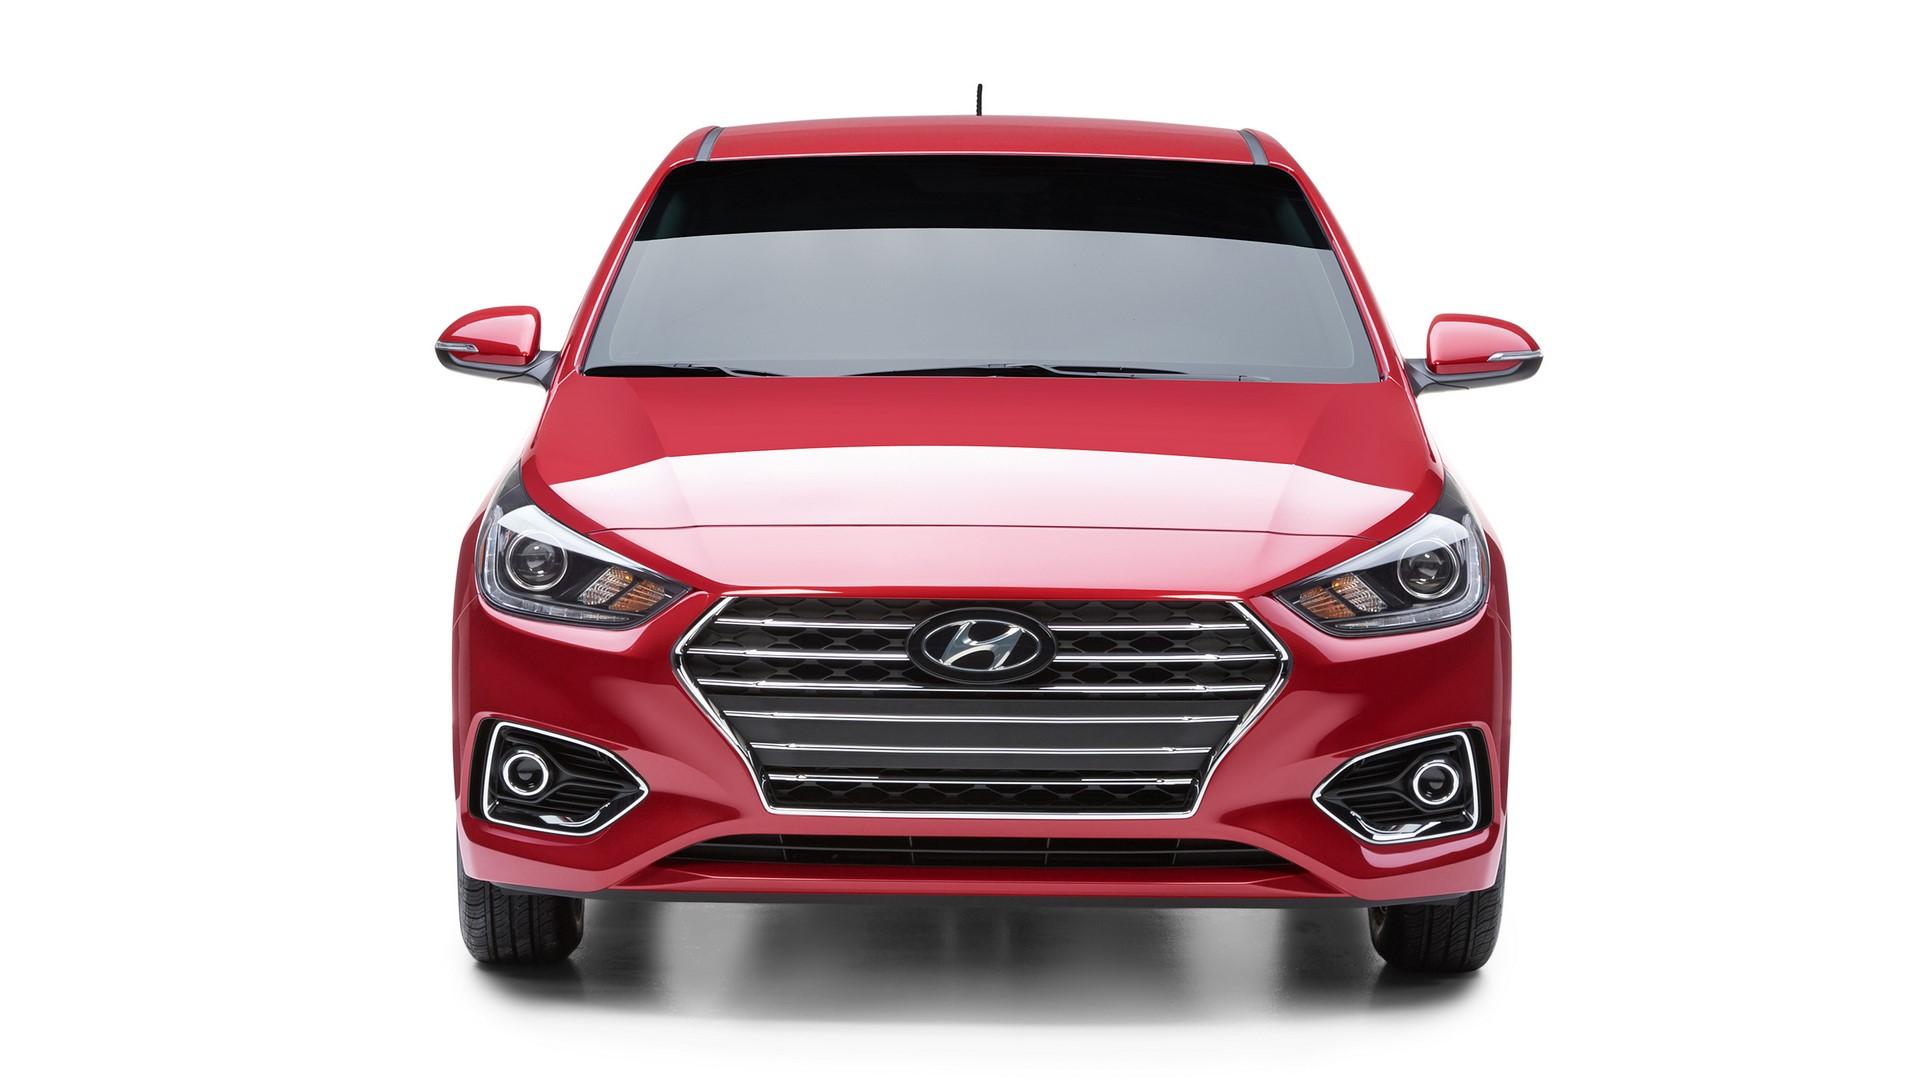 Hyundai Accent 2018 (8)